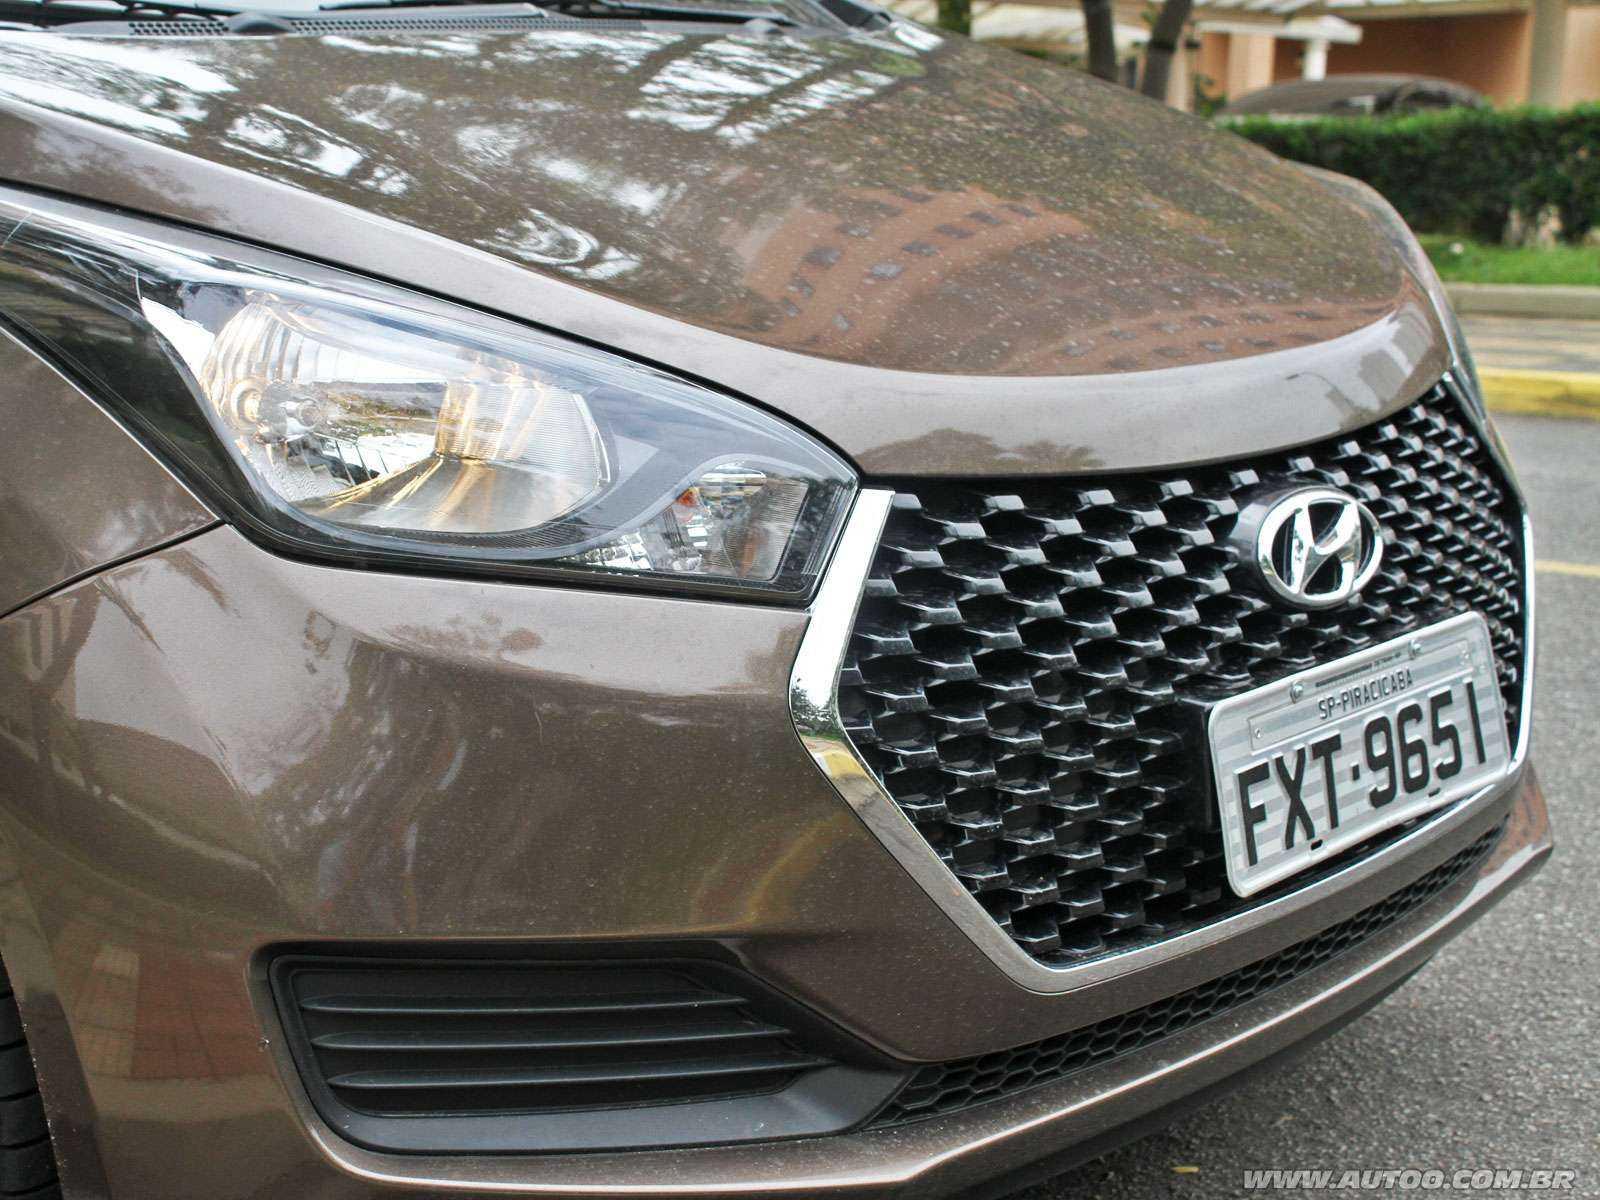 HyundaiHB20 2018 - grade frontal